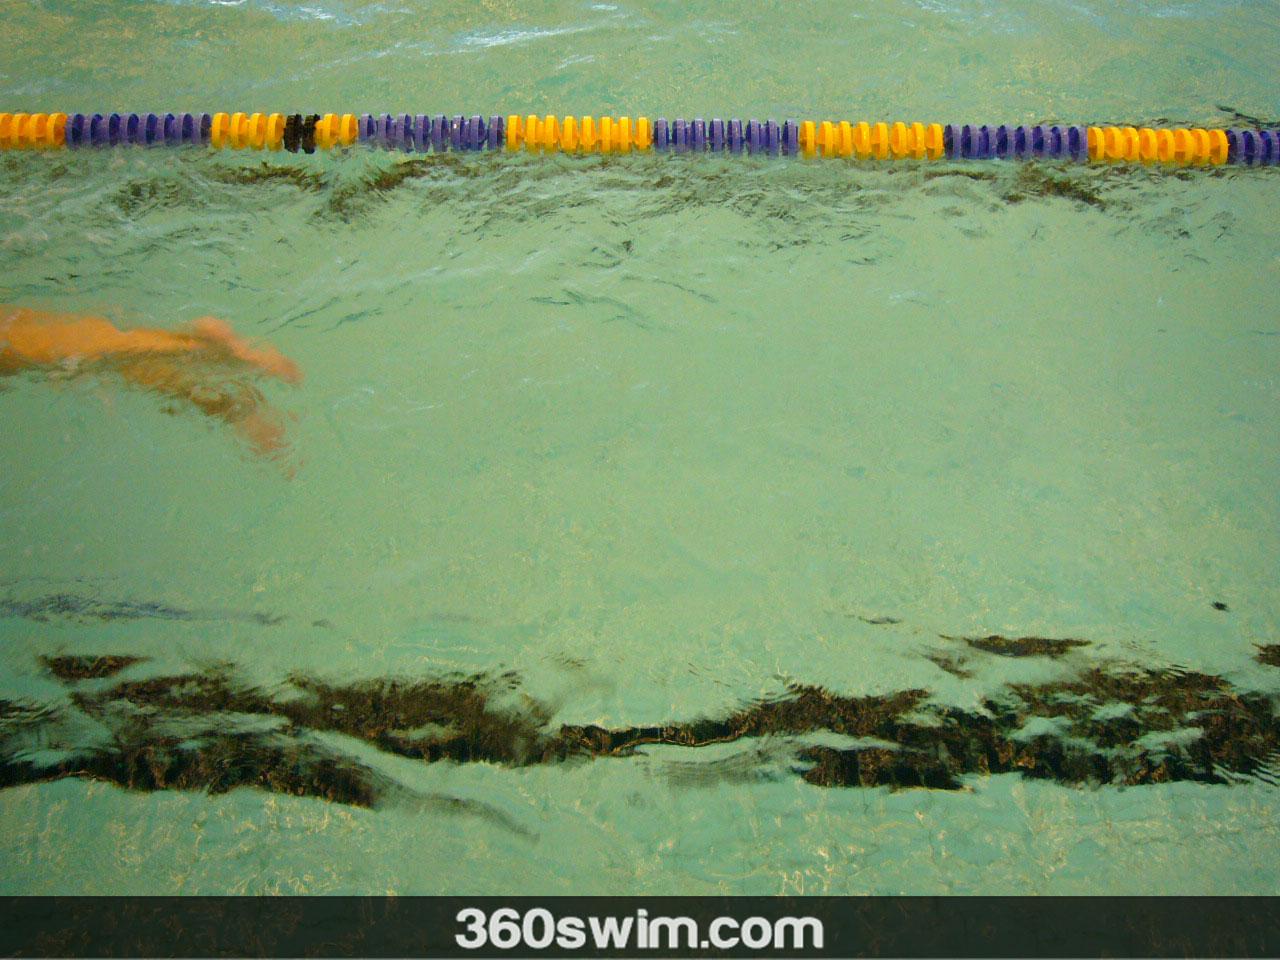 Swim kick - keep it in the bucket